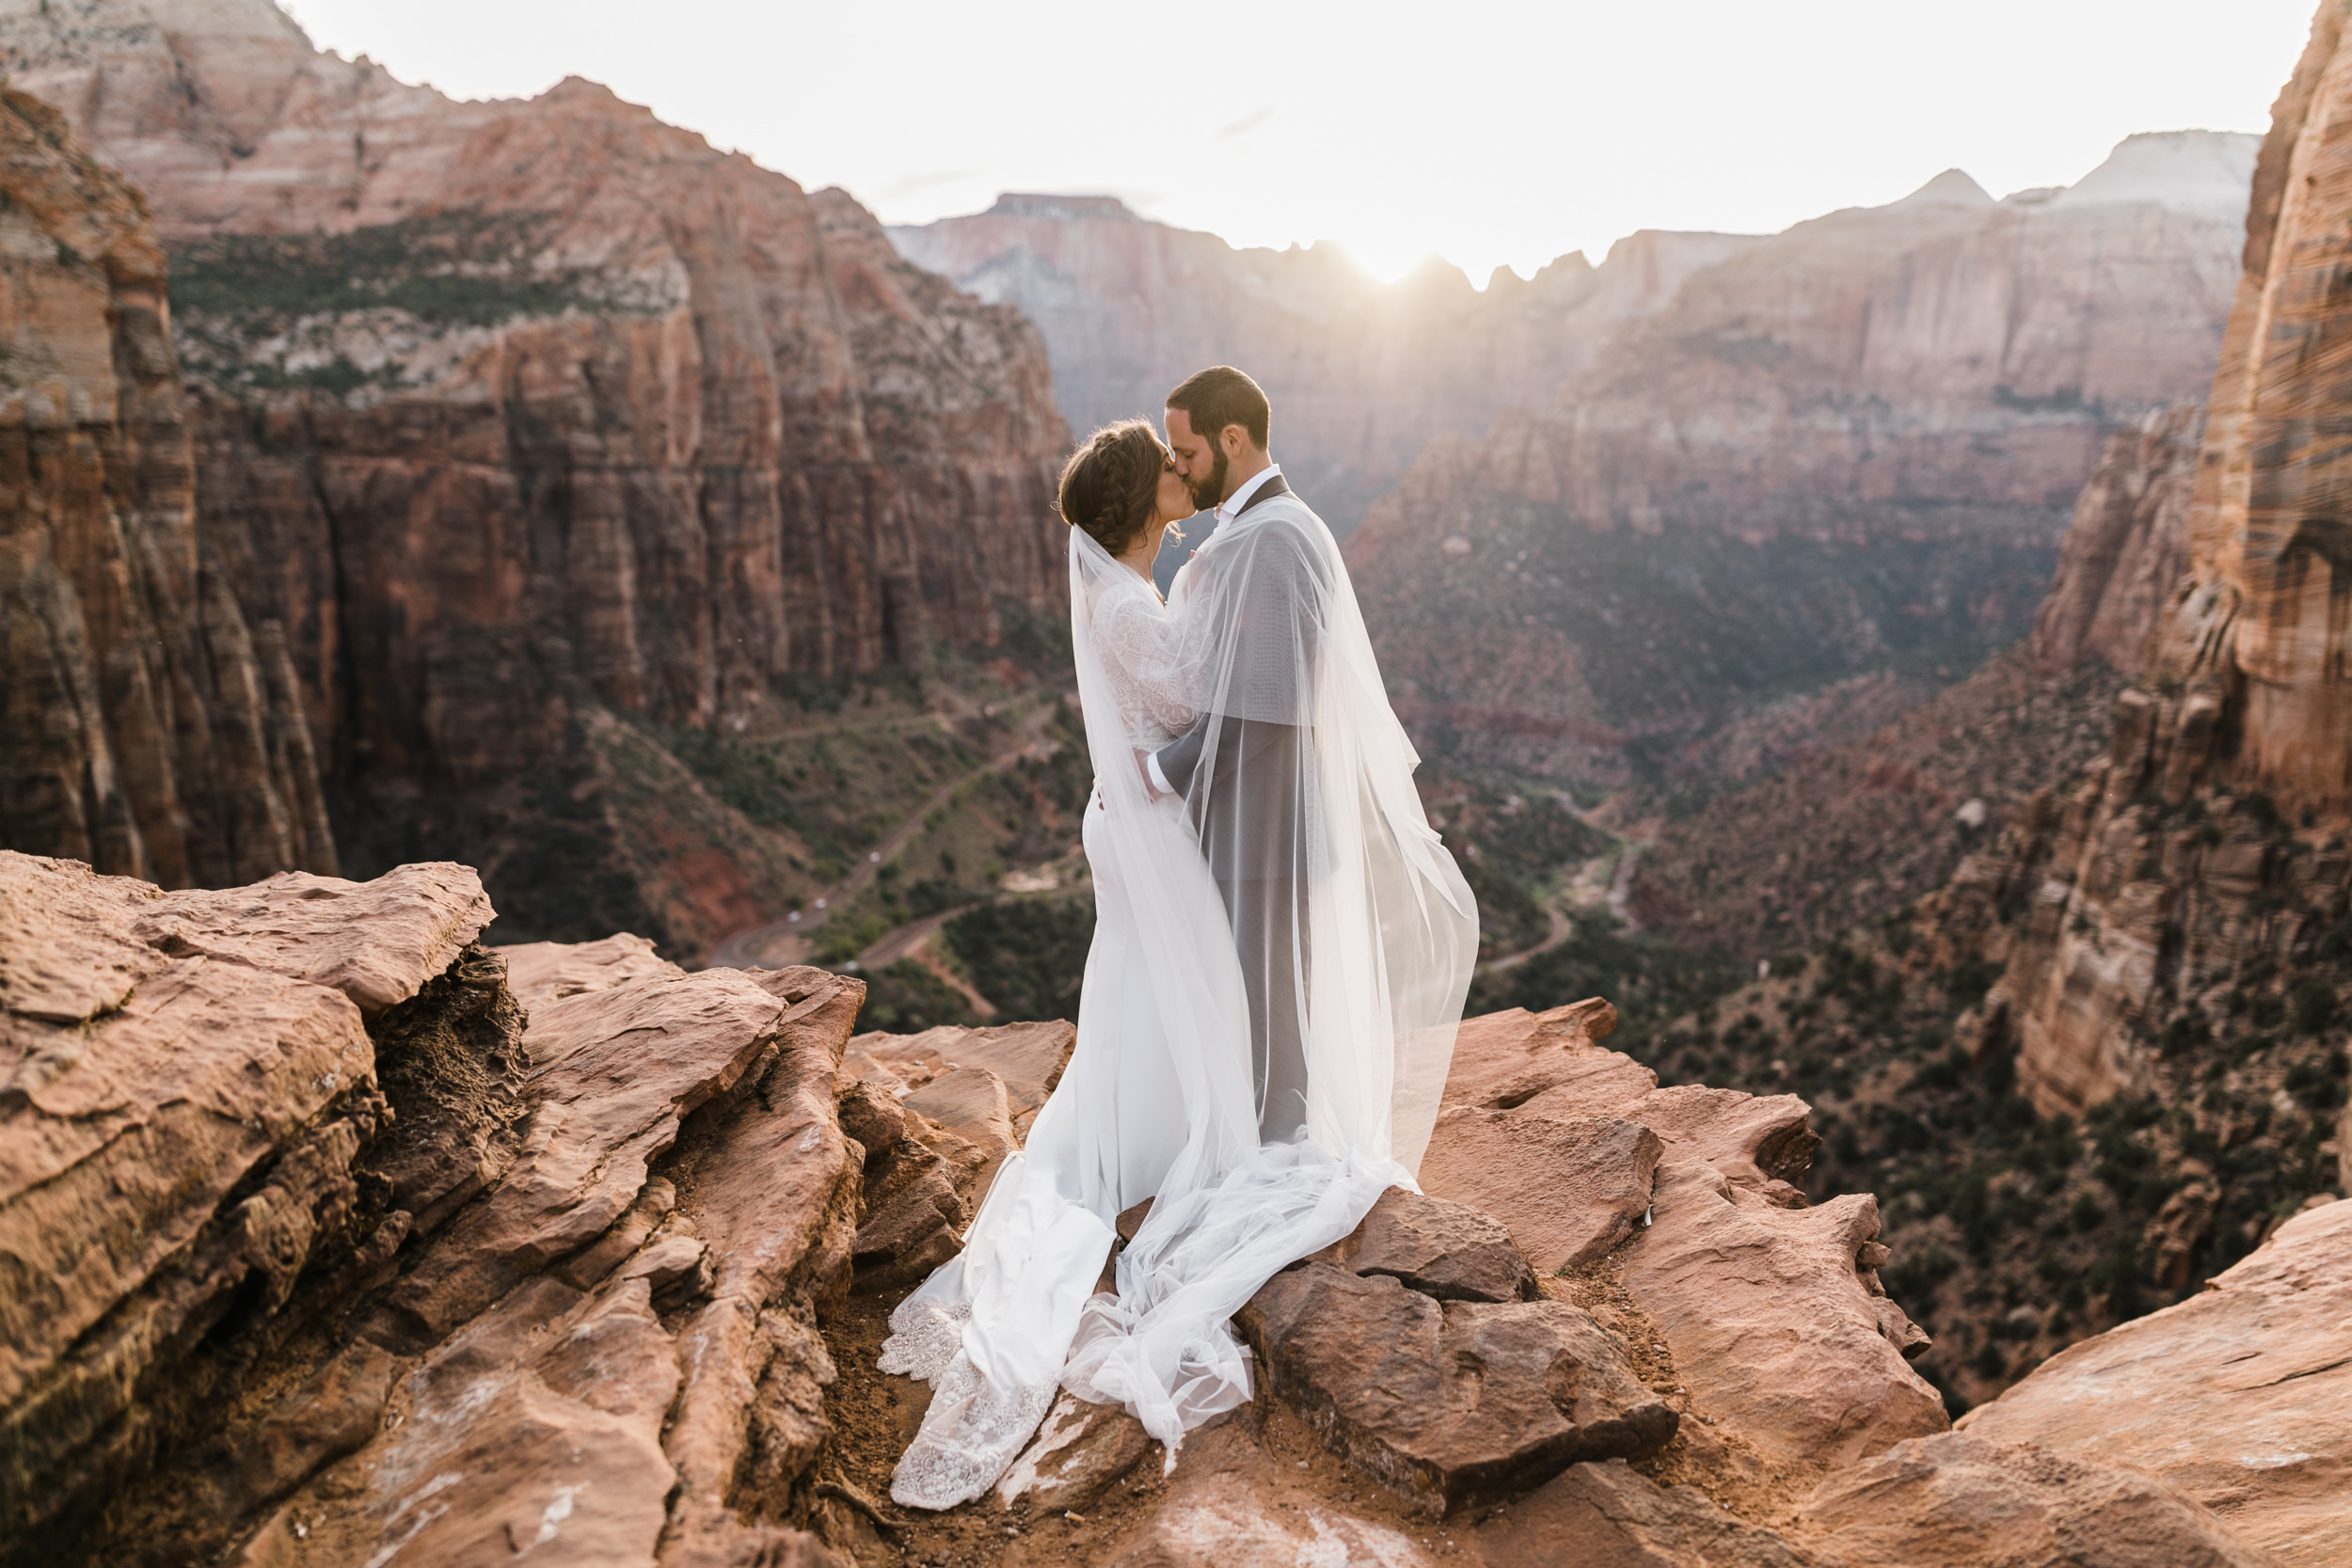 Zion-National-Park-Adventure-Wedding-Hearnes-Elopement-Photography-44.jpg